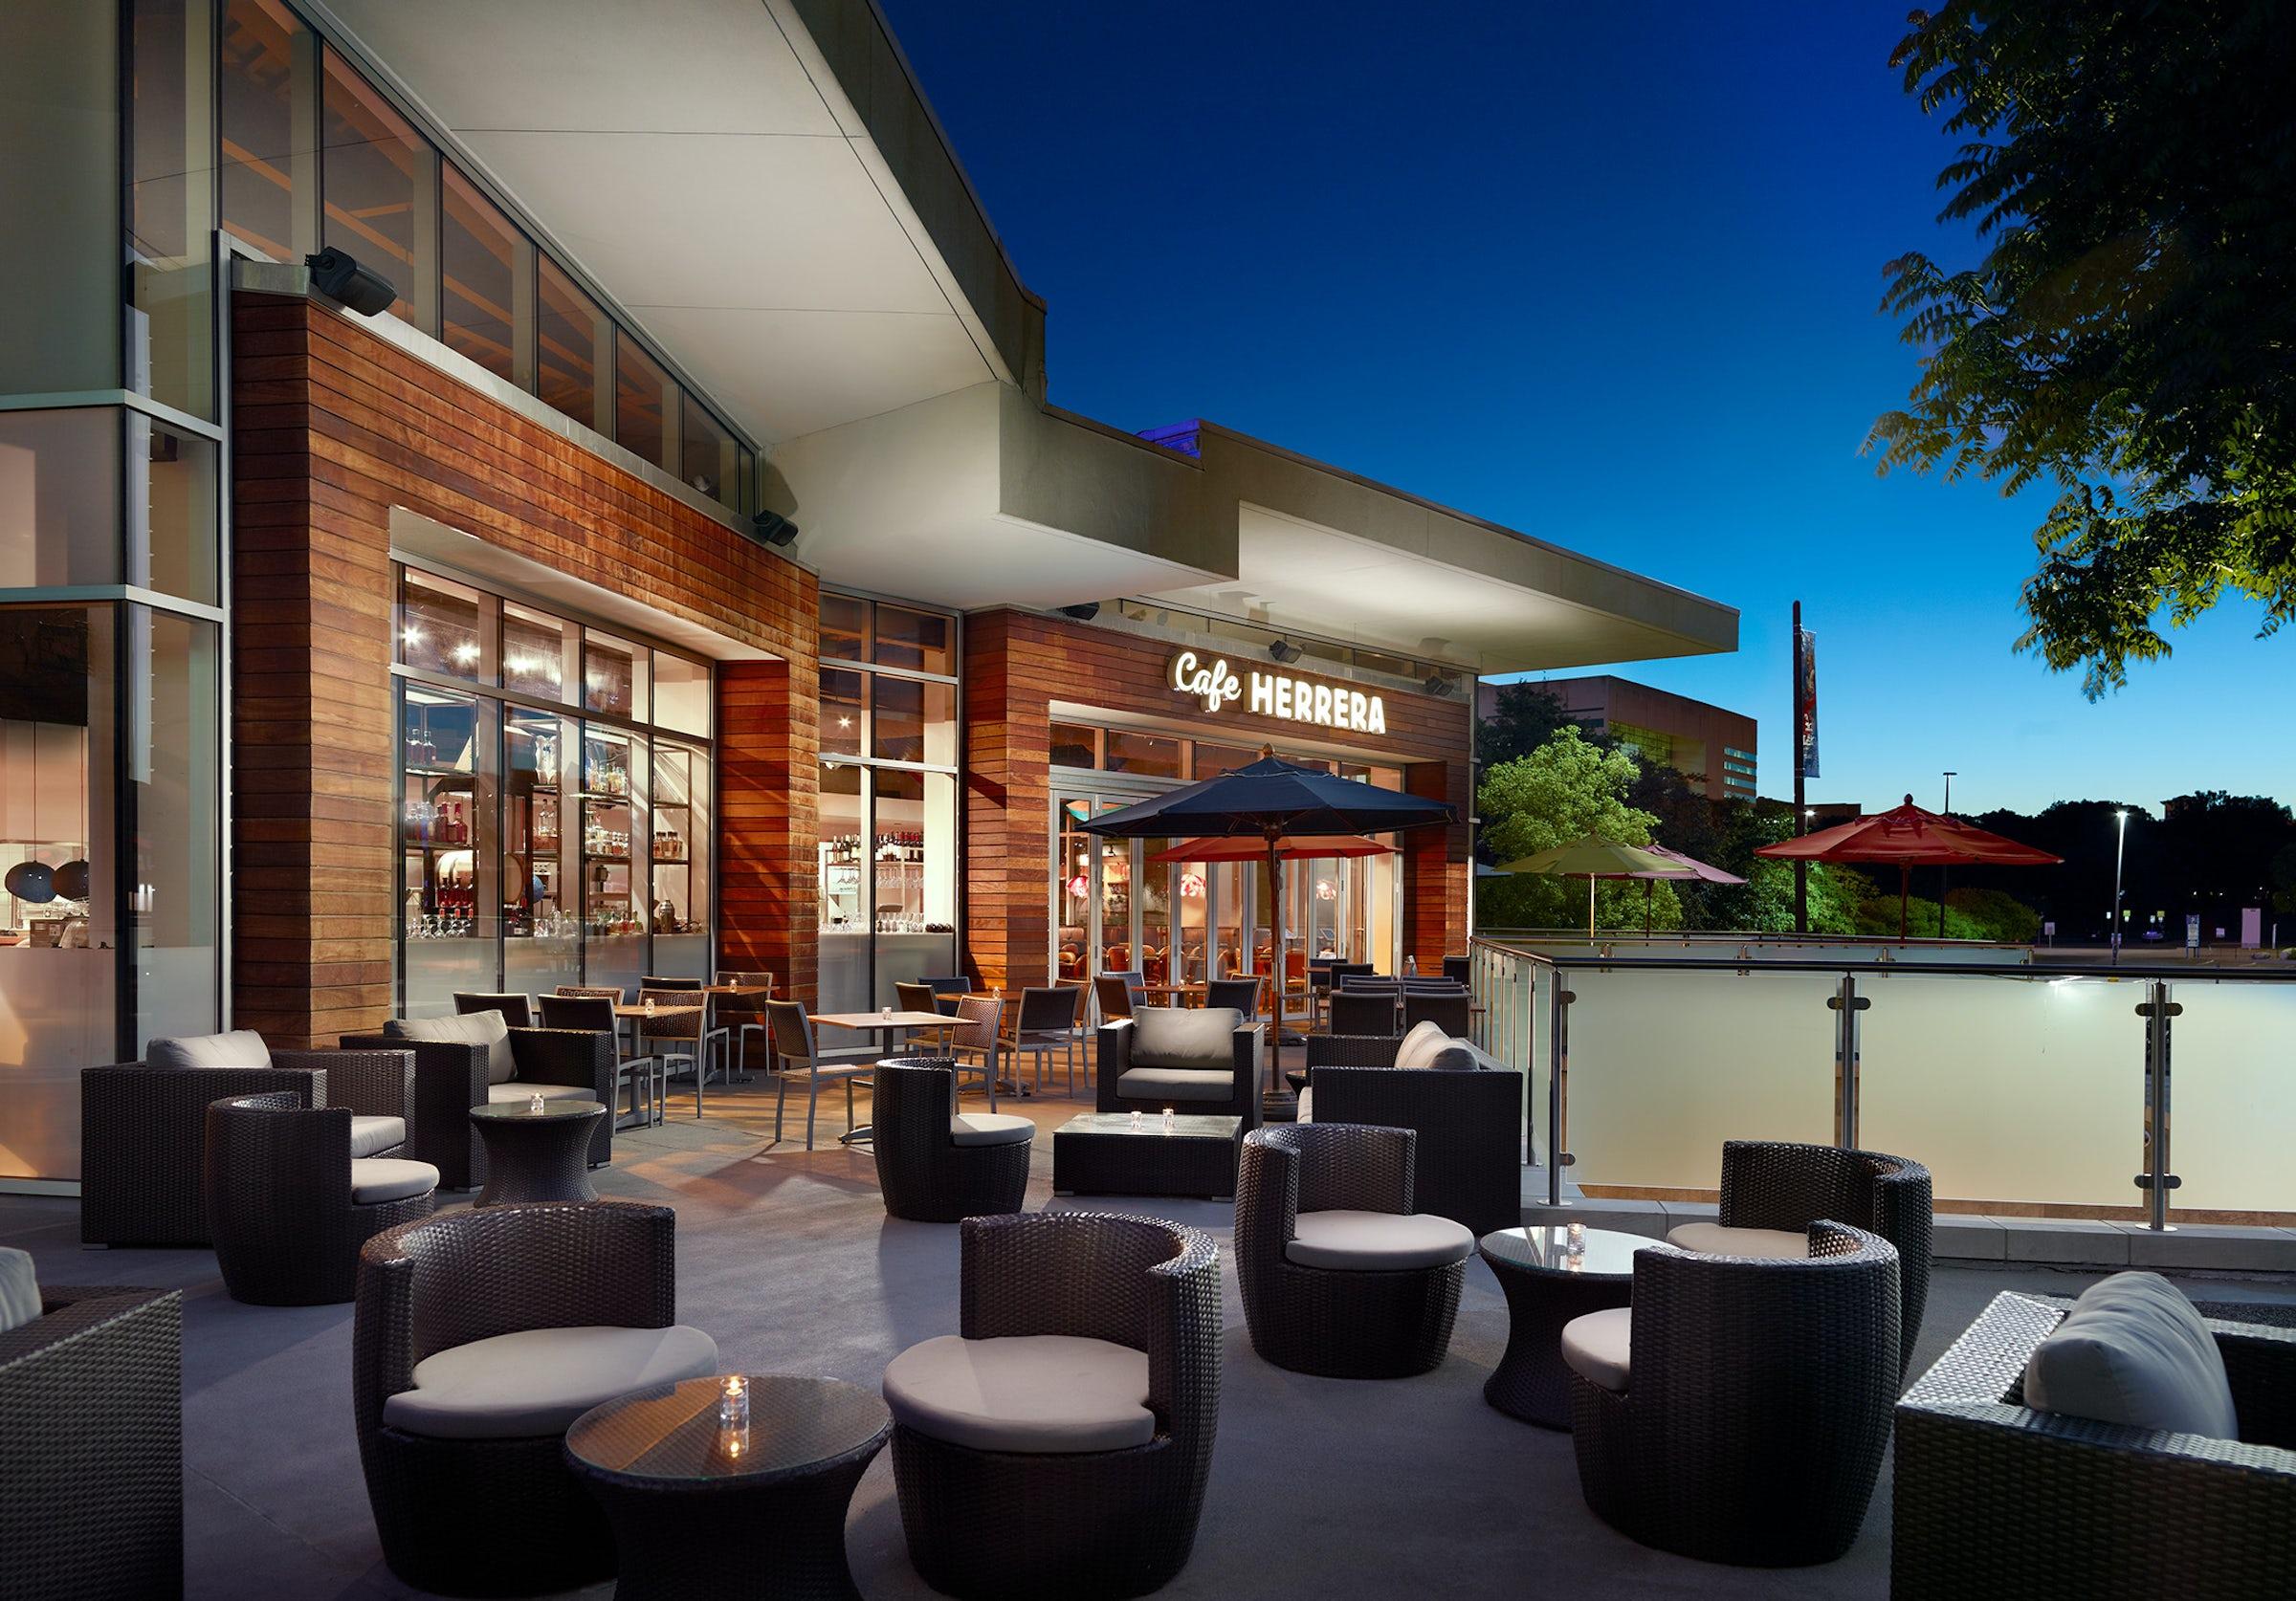 Cafe Herrera in Beyond Dallas